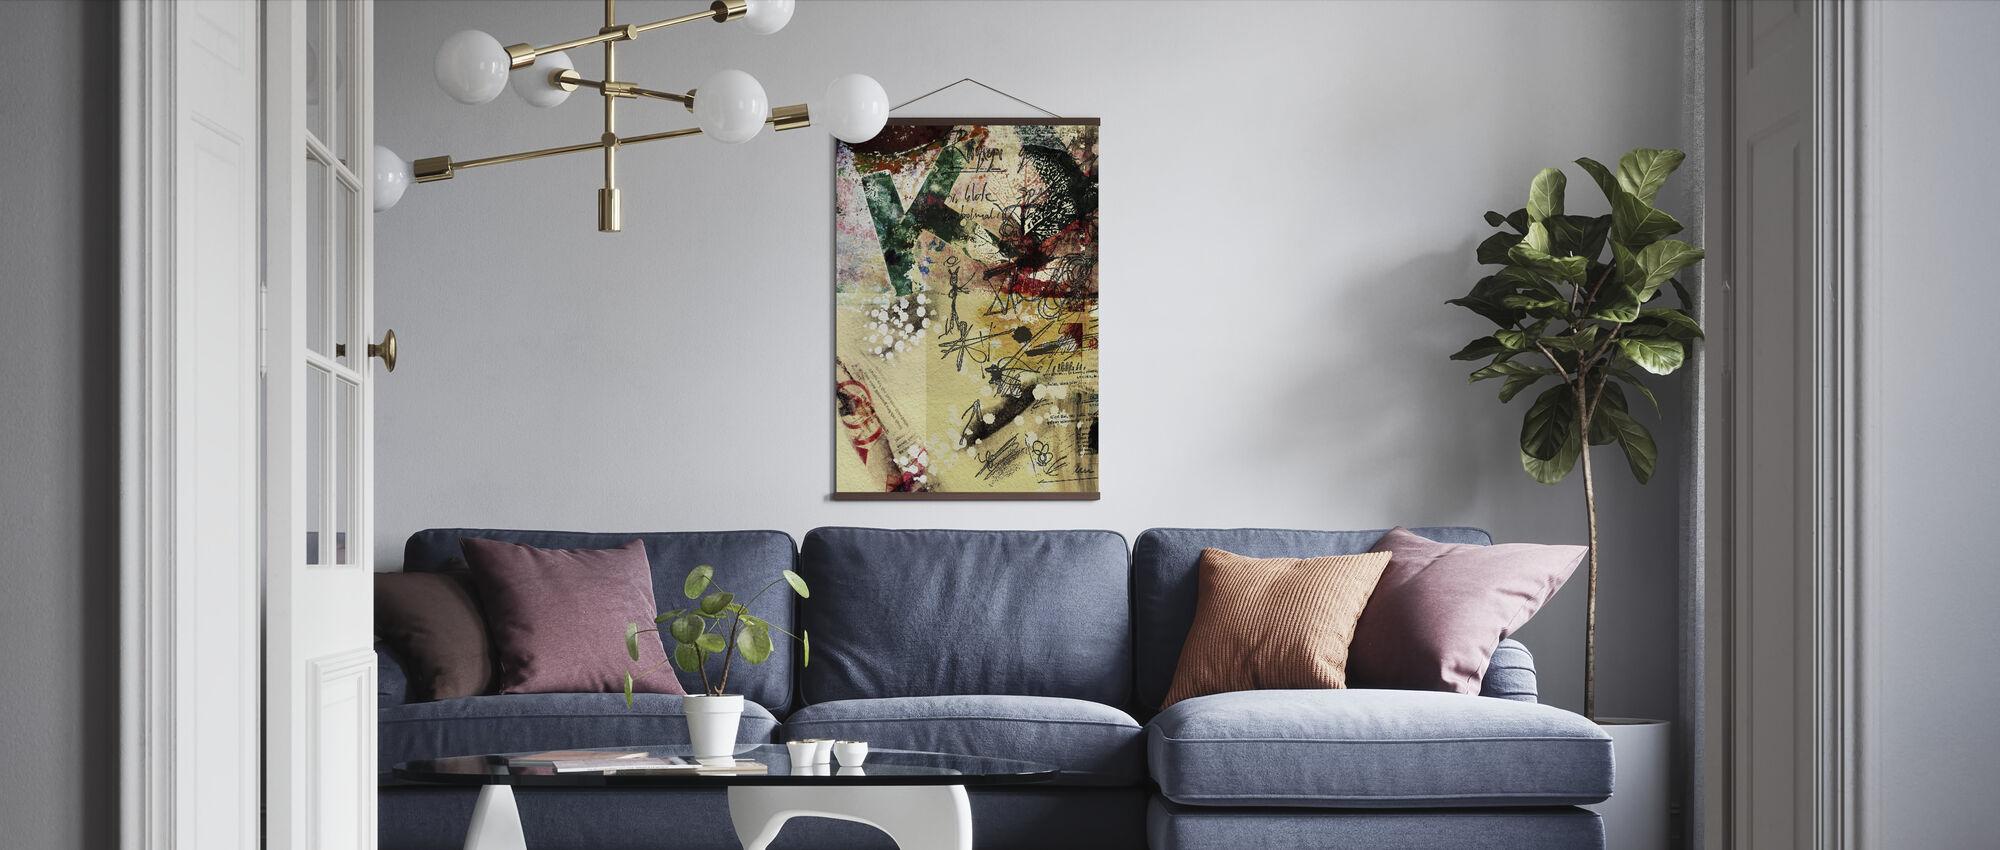 Plakat Collage - Plakat - Stue